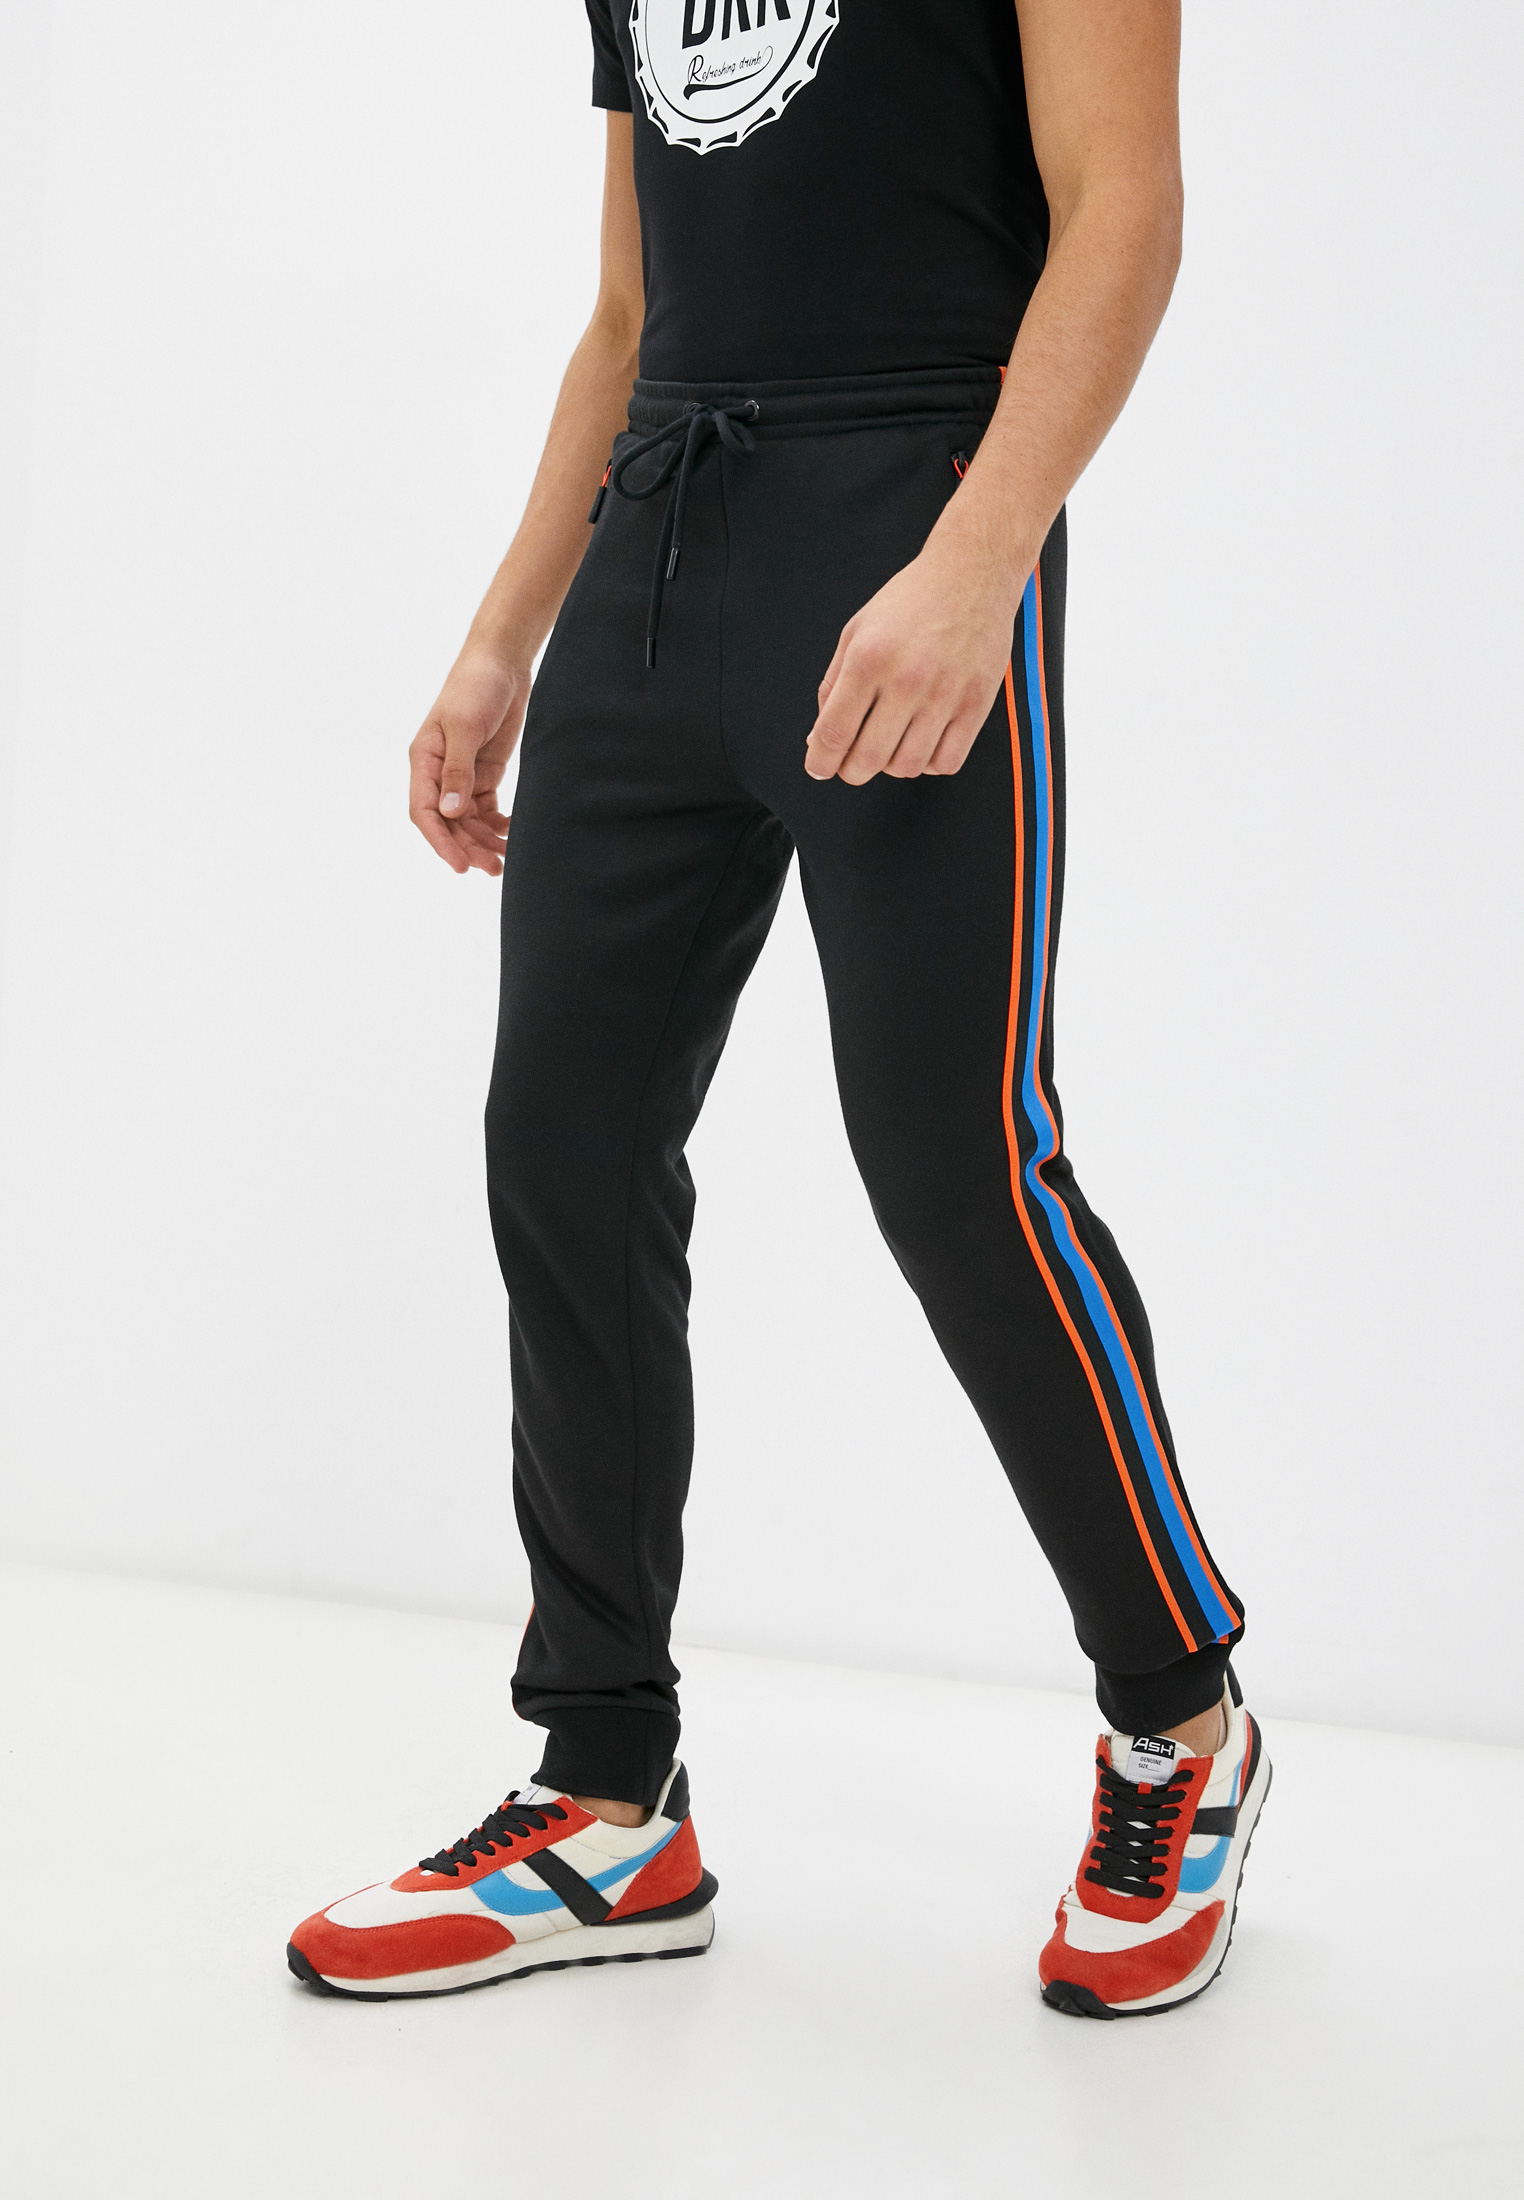 Мужские спортивные брюки Bikkembergs (Биккембергс) C 1 135 81 M 4252